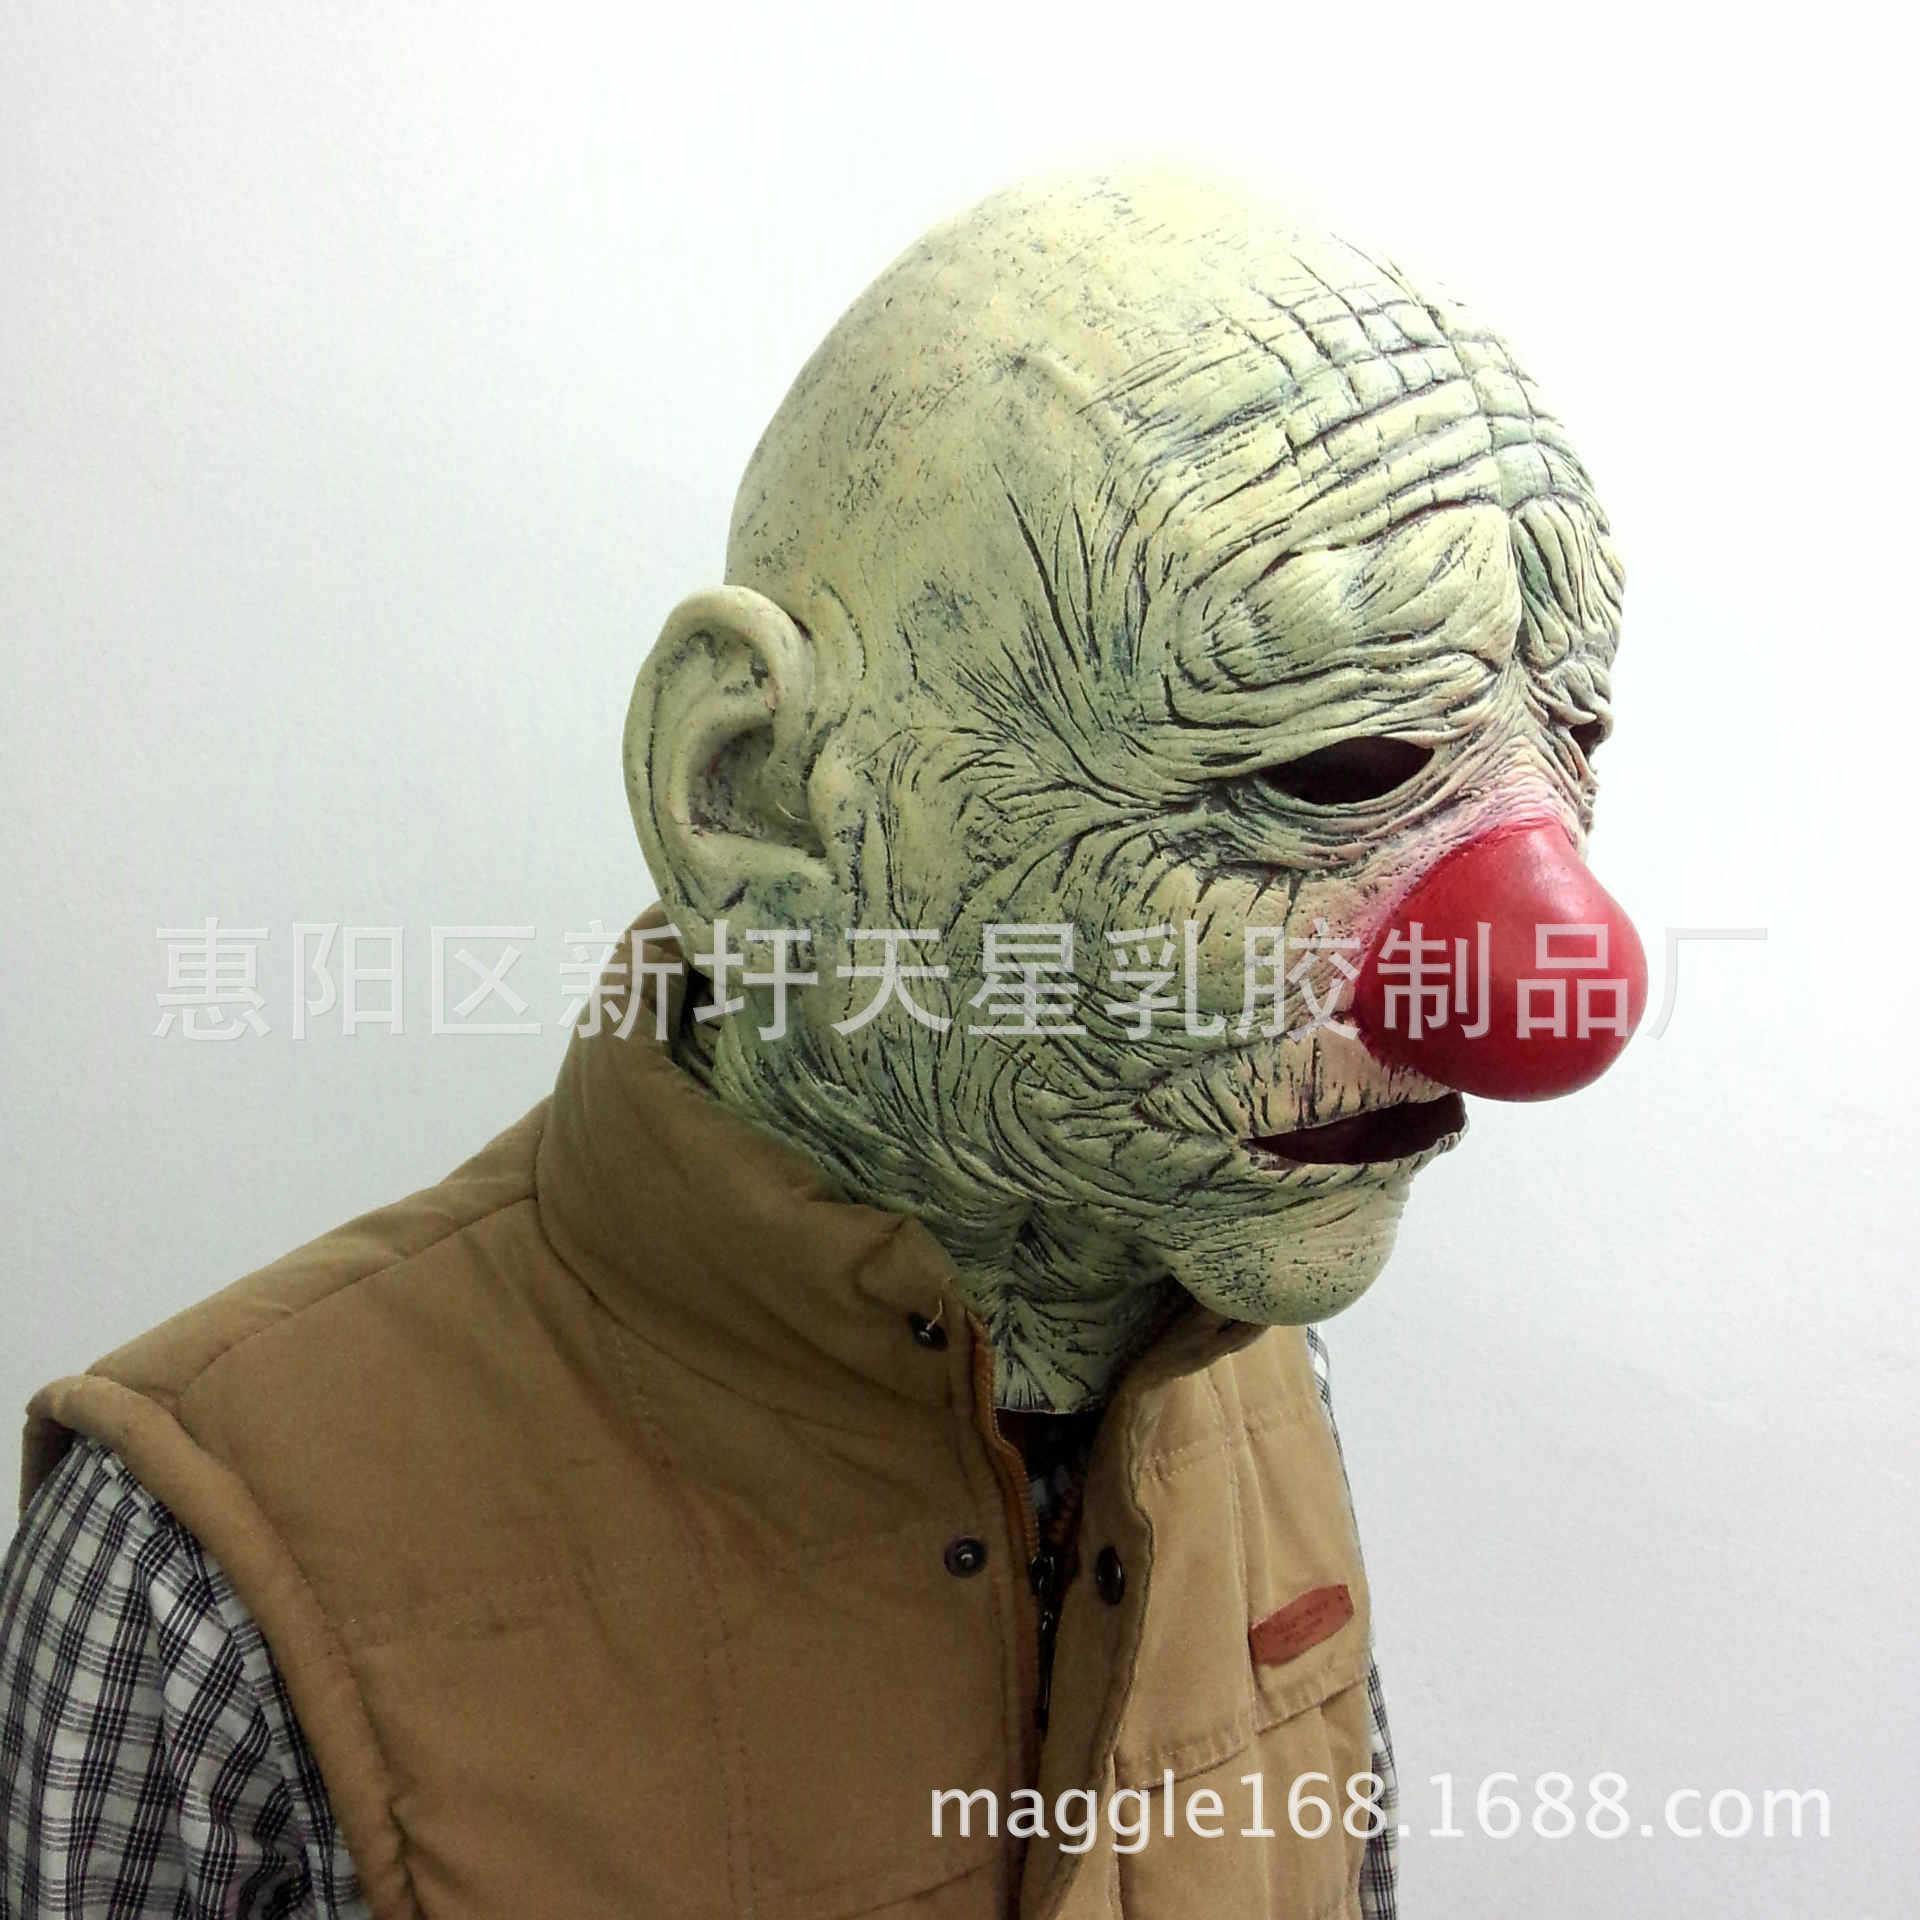 Funny-red-nose-elderly-bald-old-man-mask-Halloween-mask -cosplay-carnival-props.jpg